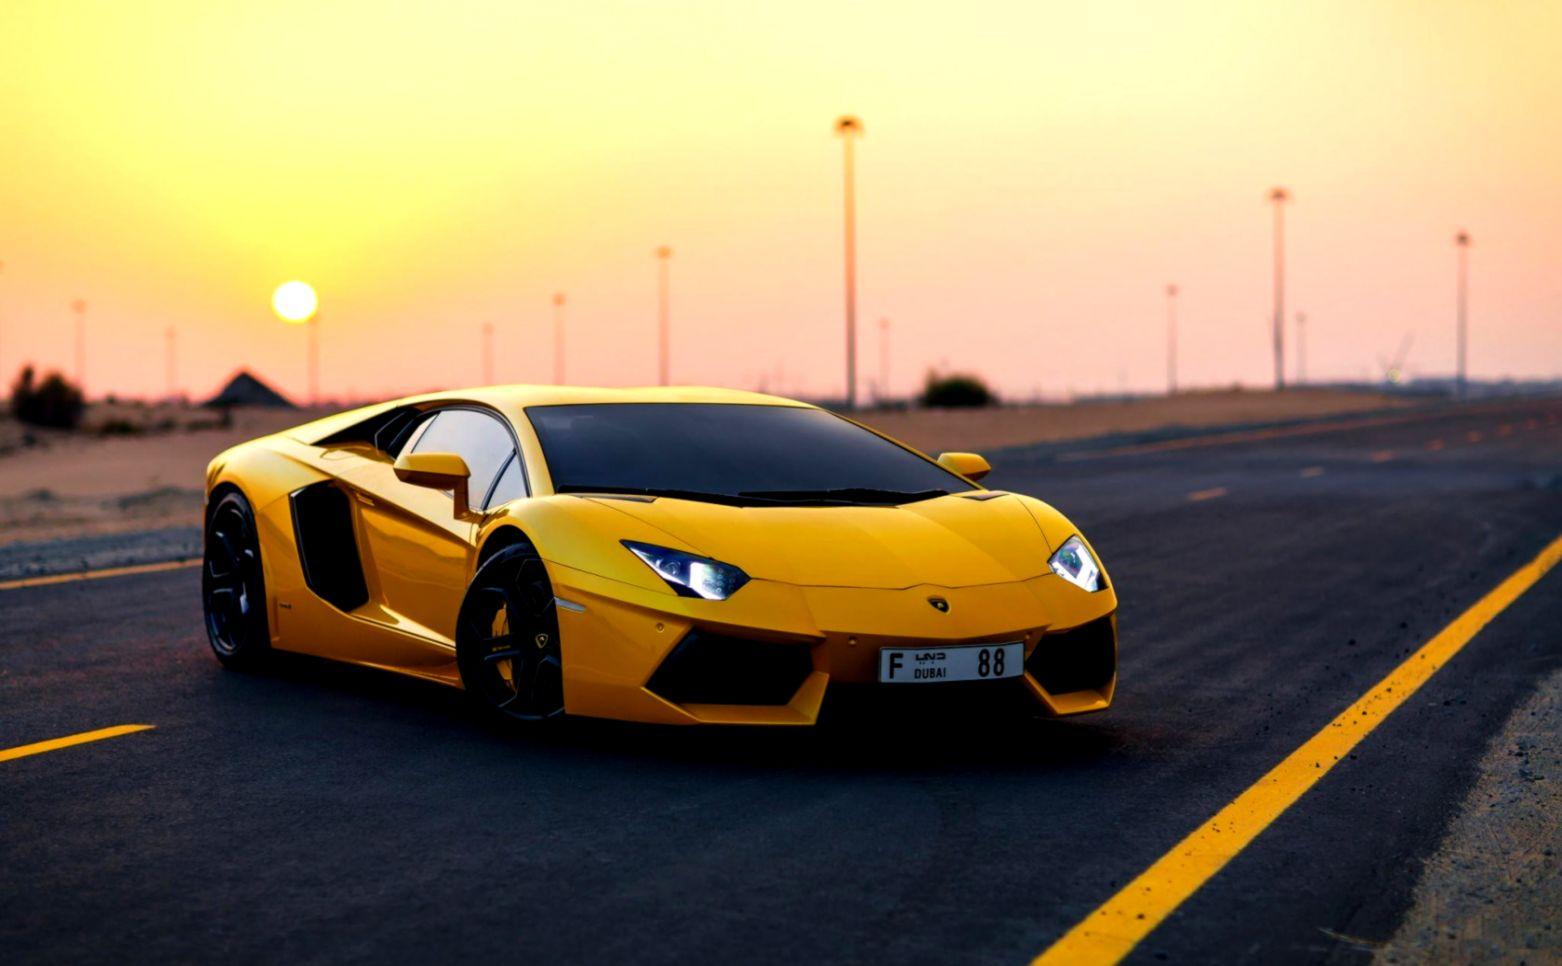 . Awesome Car Lamborghini Aventador Hd Wallpaper   Gandoss Wallpapers